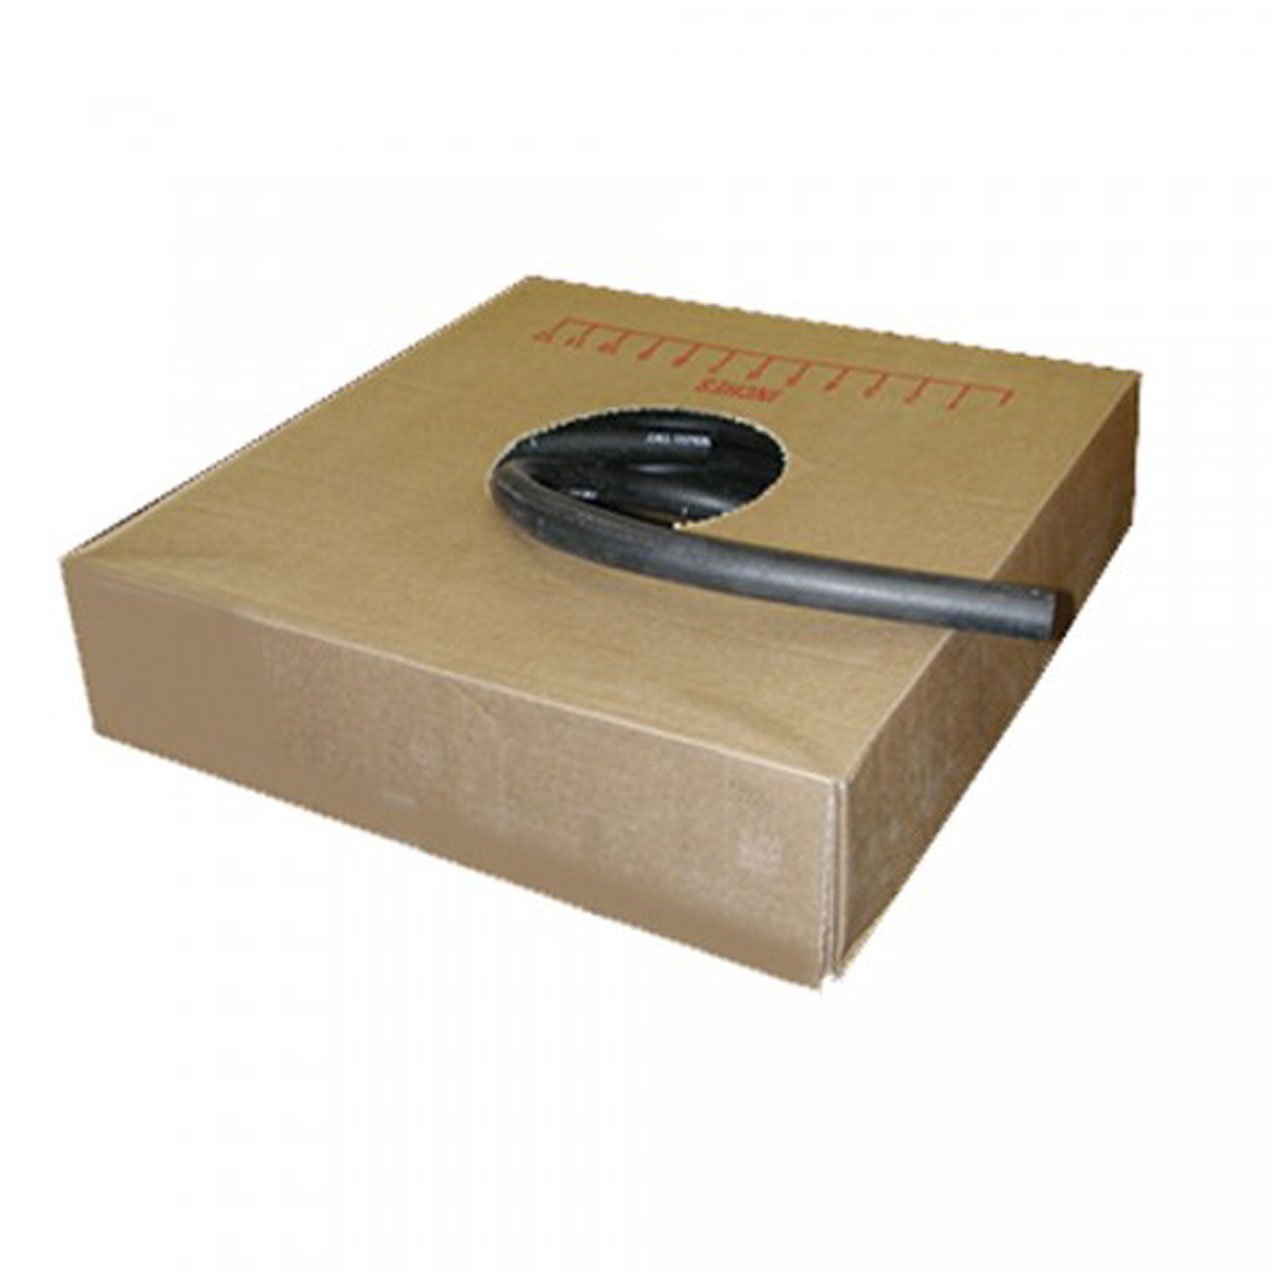 7//8 Id x 50 Jones Stephens D10875 Dishwasher Hose Black Small